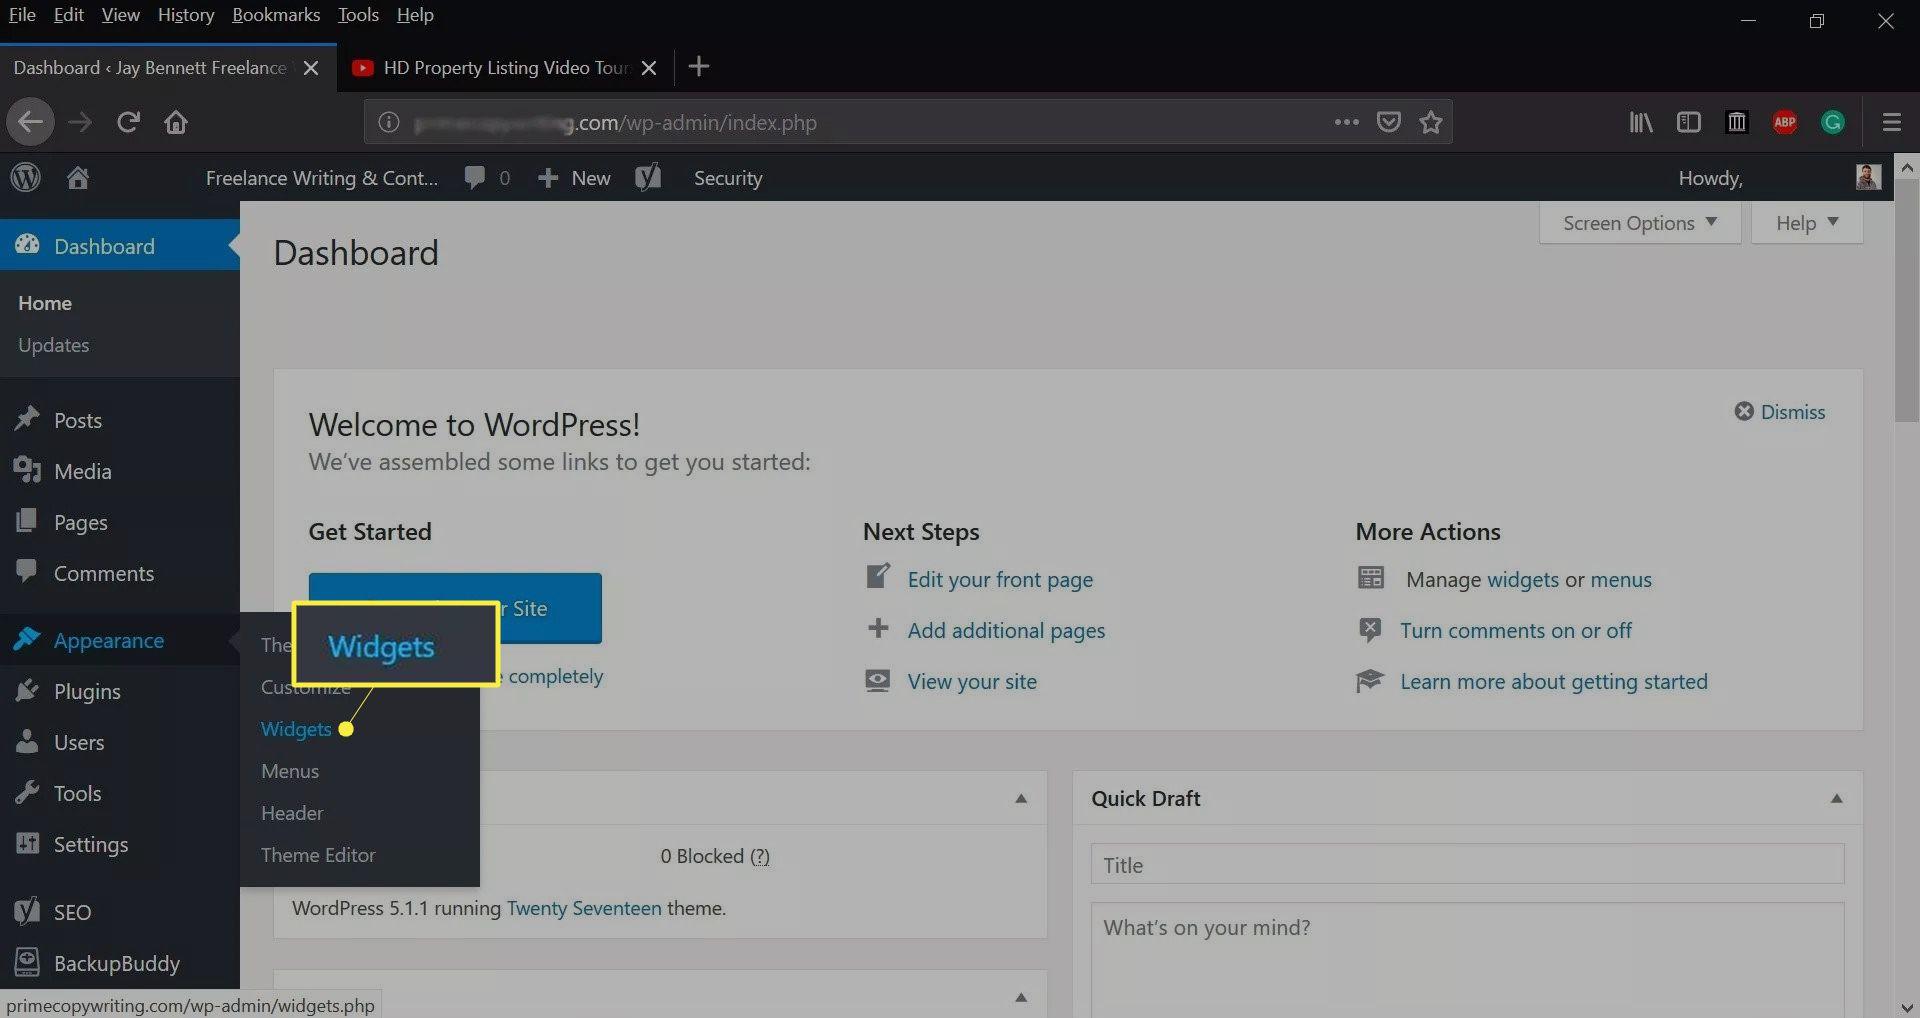 Widgets on the WordPress dashboard